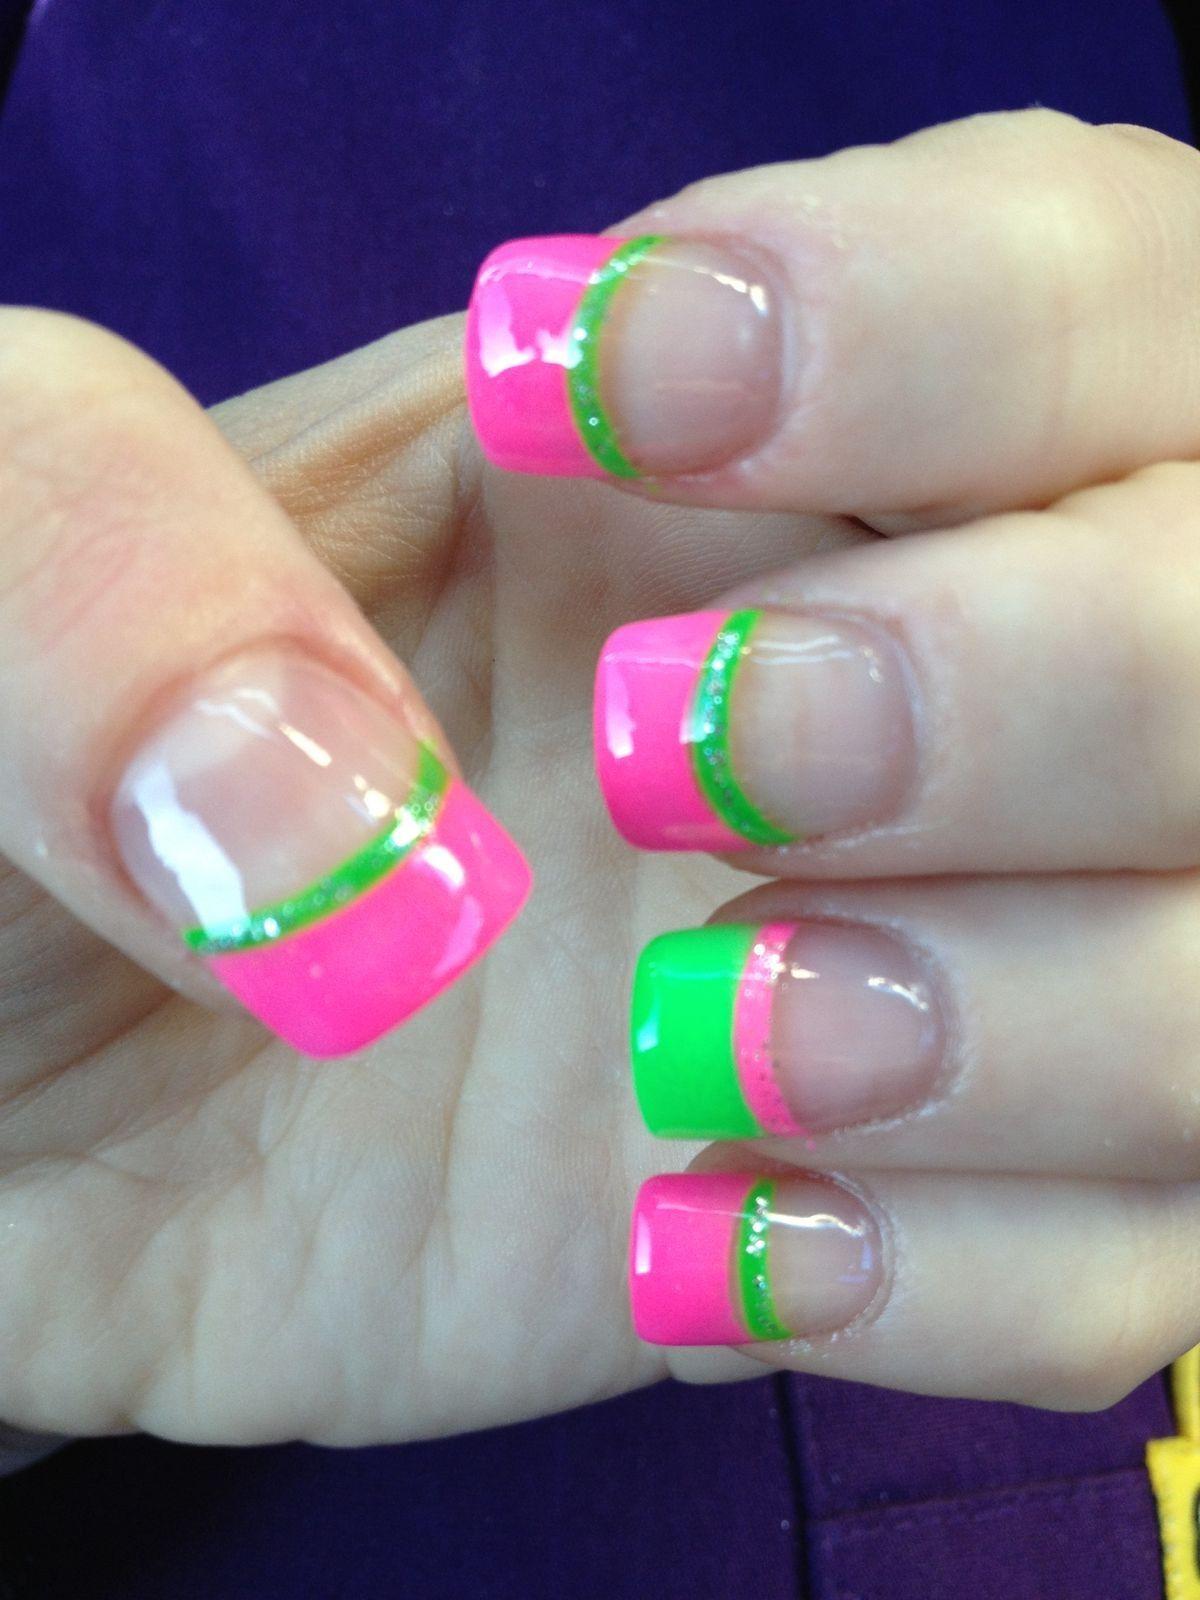 pin mackenzie geesaman nails